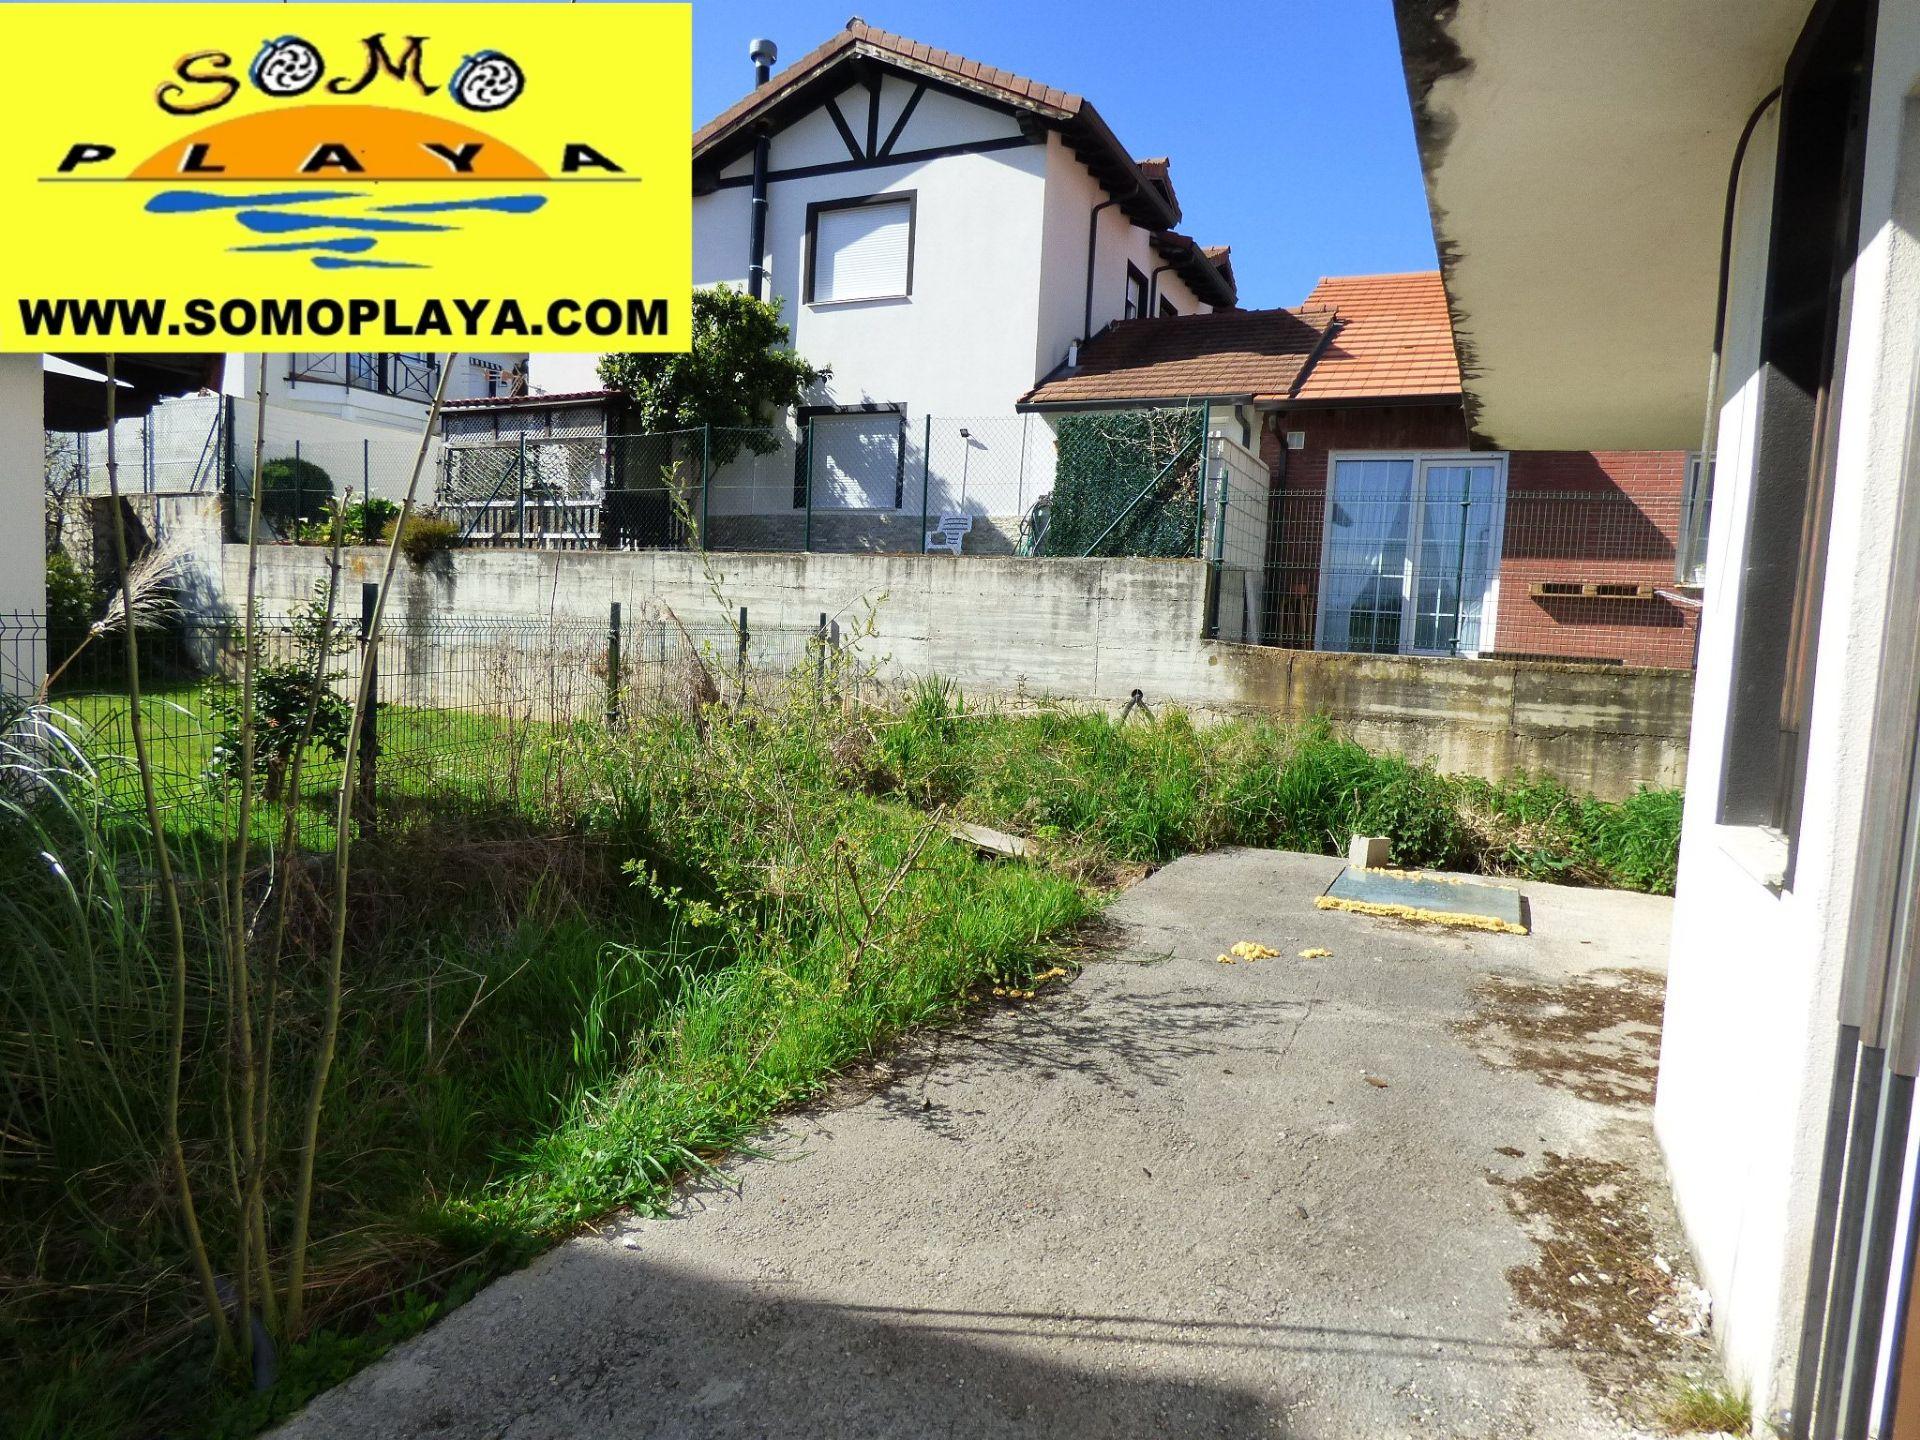 Villa en venta en Ribamontán al Monte zona Cubas